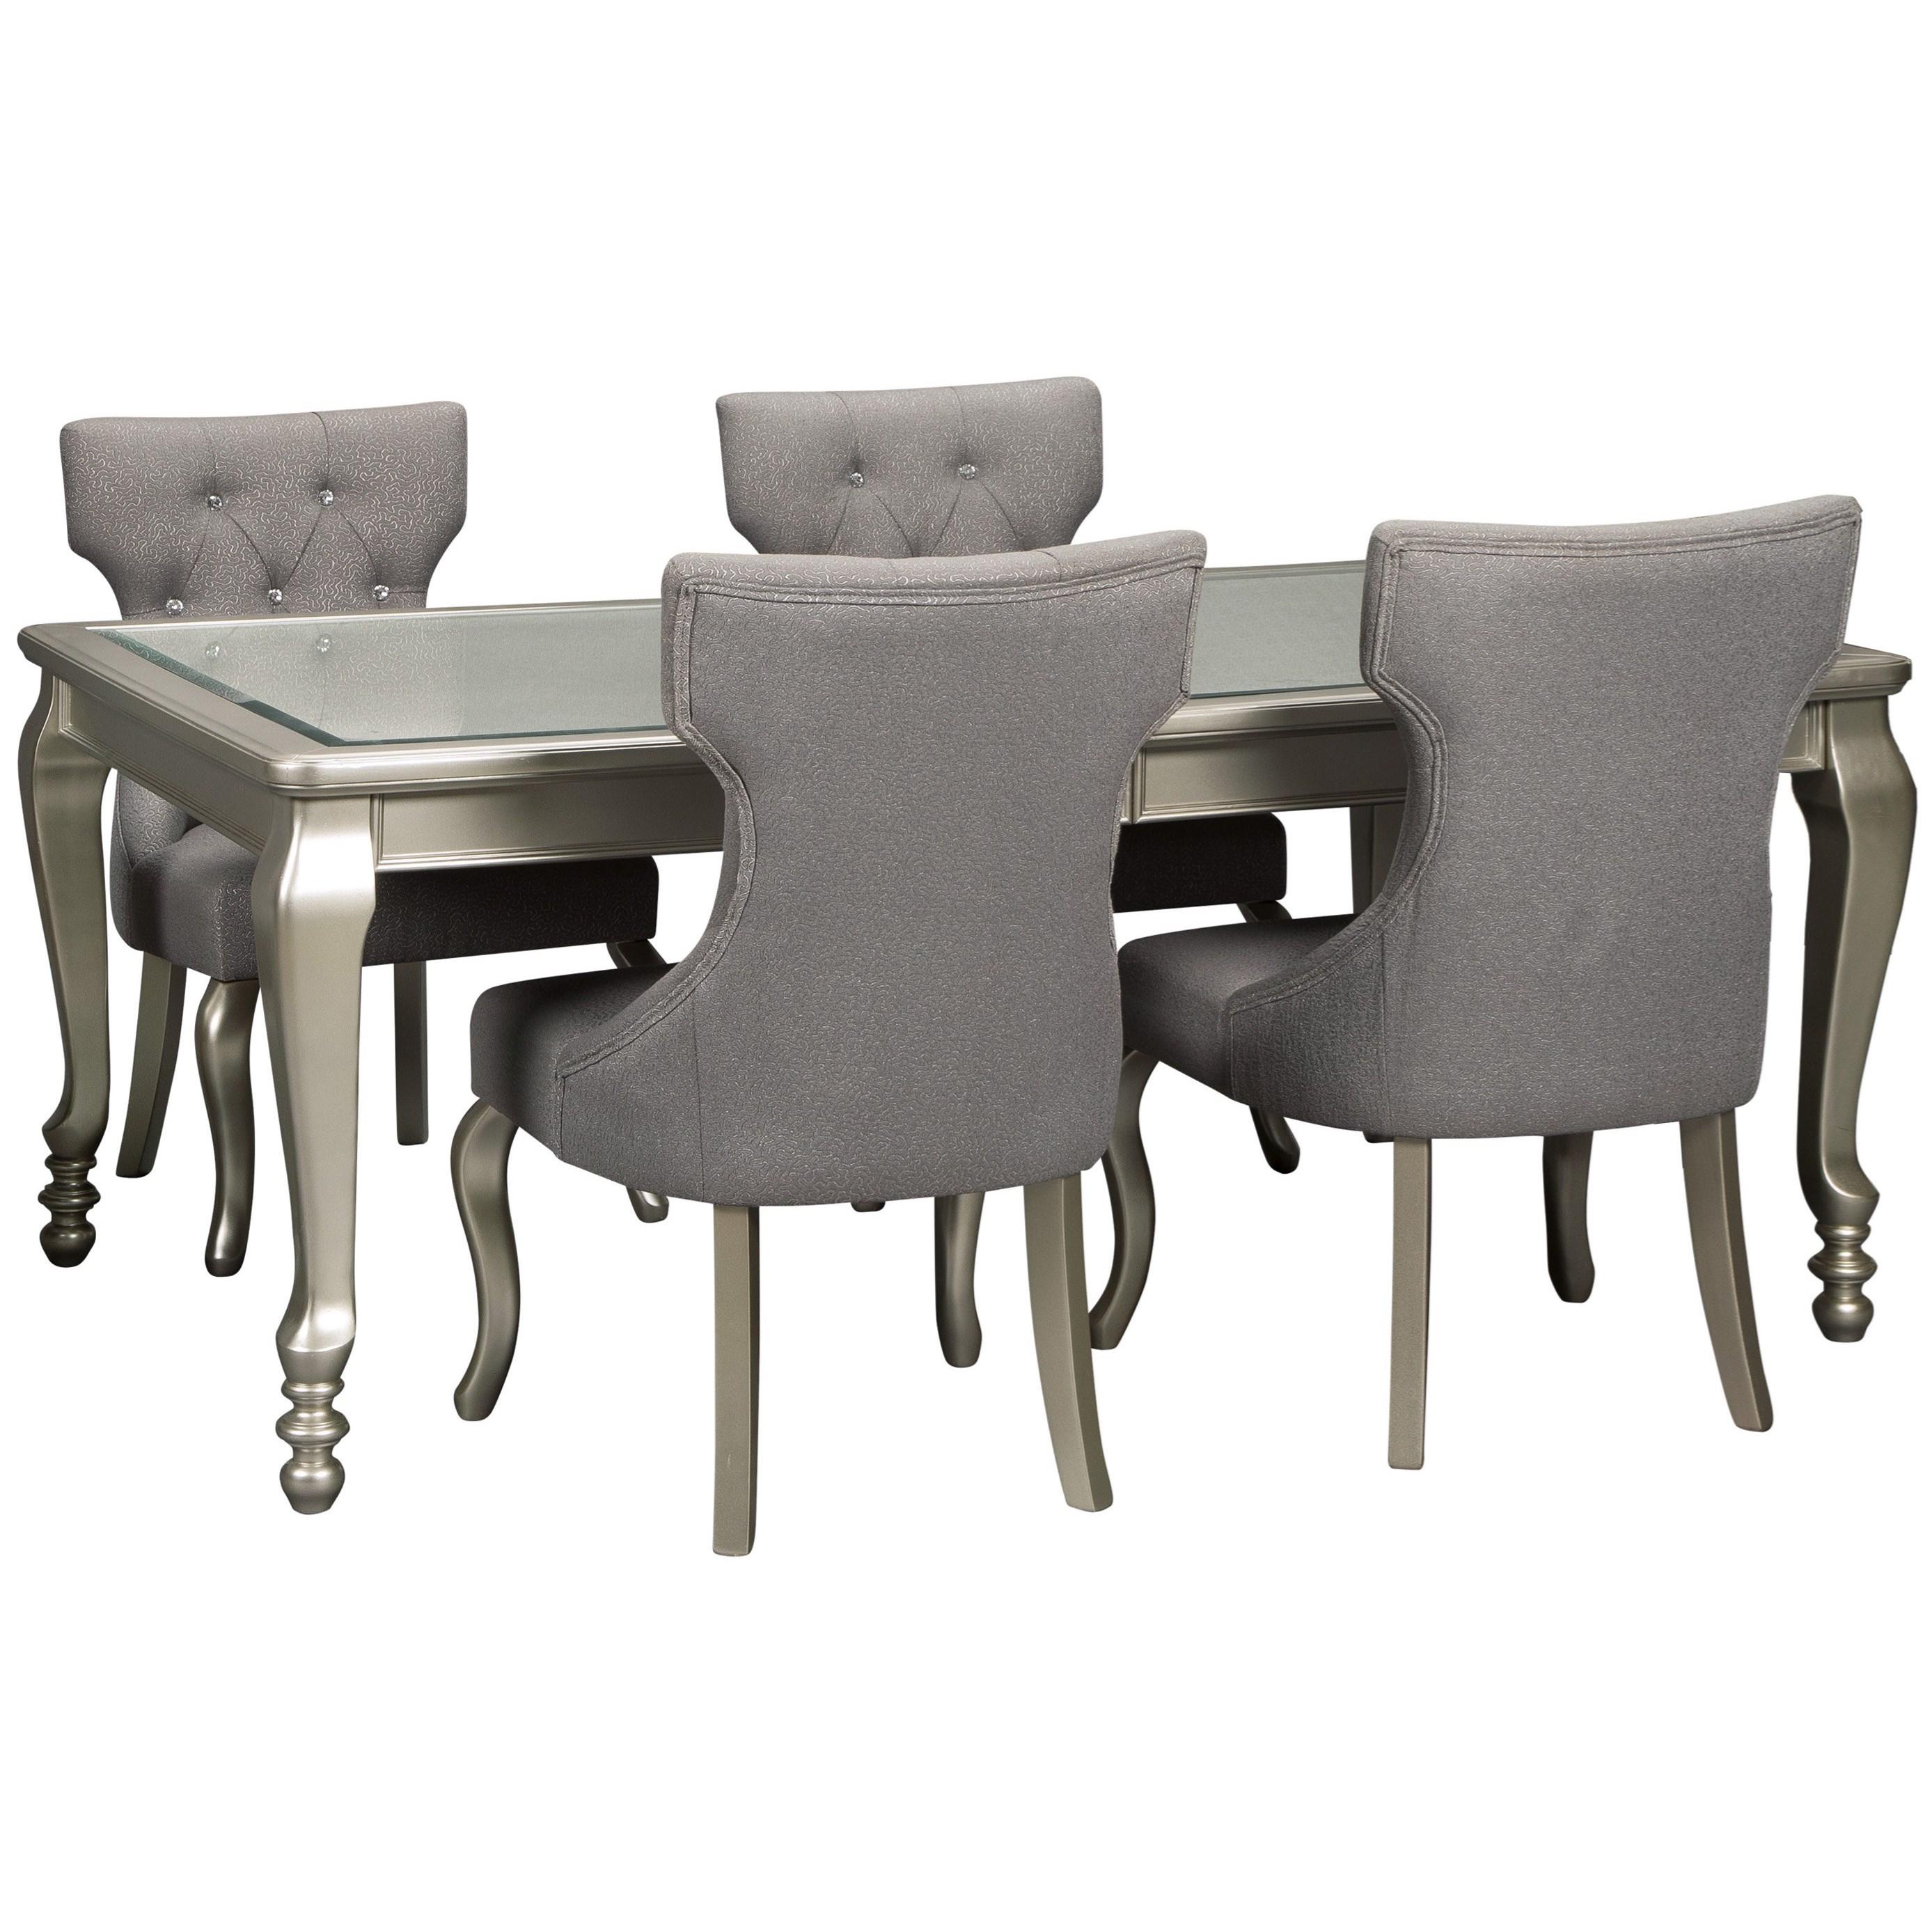 Coralayne 5-Piece Rectangular Dining Room Table Set by Ashley (Signature Design) at Johnny Janosik